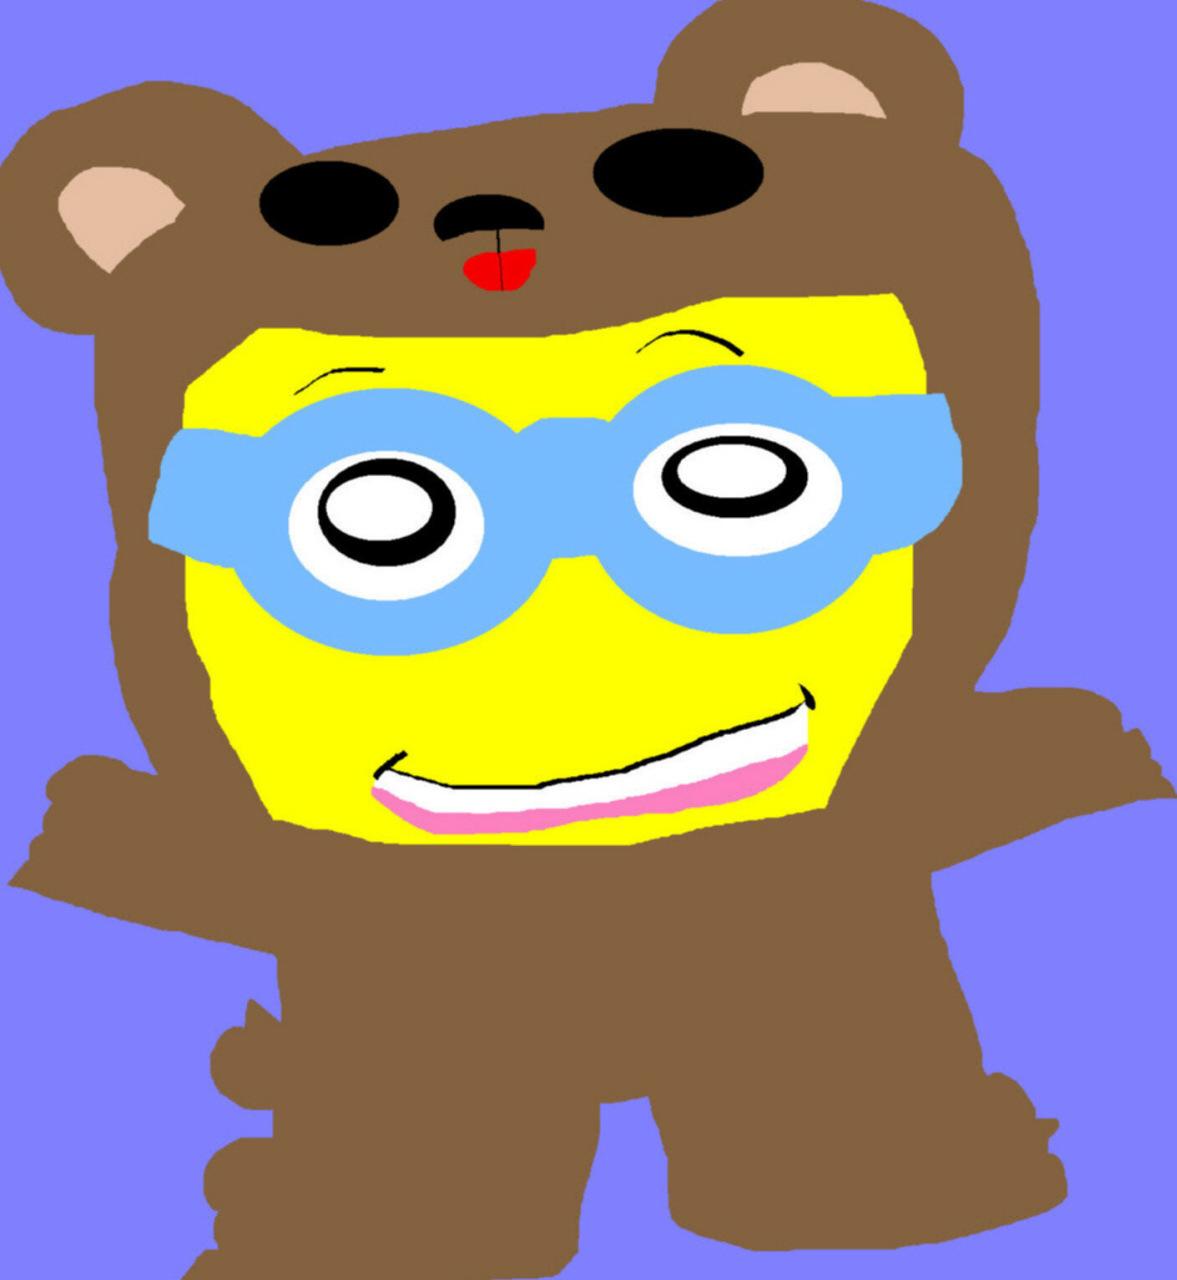 Bob's Bear PJs MS Paint^^ by Falconlobo